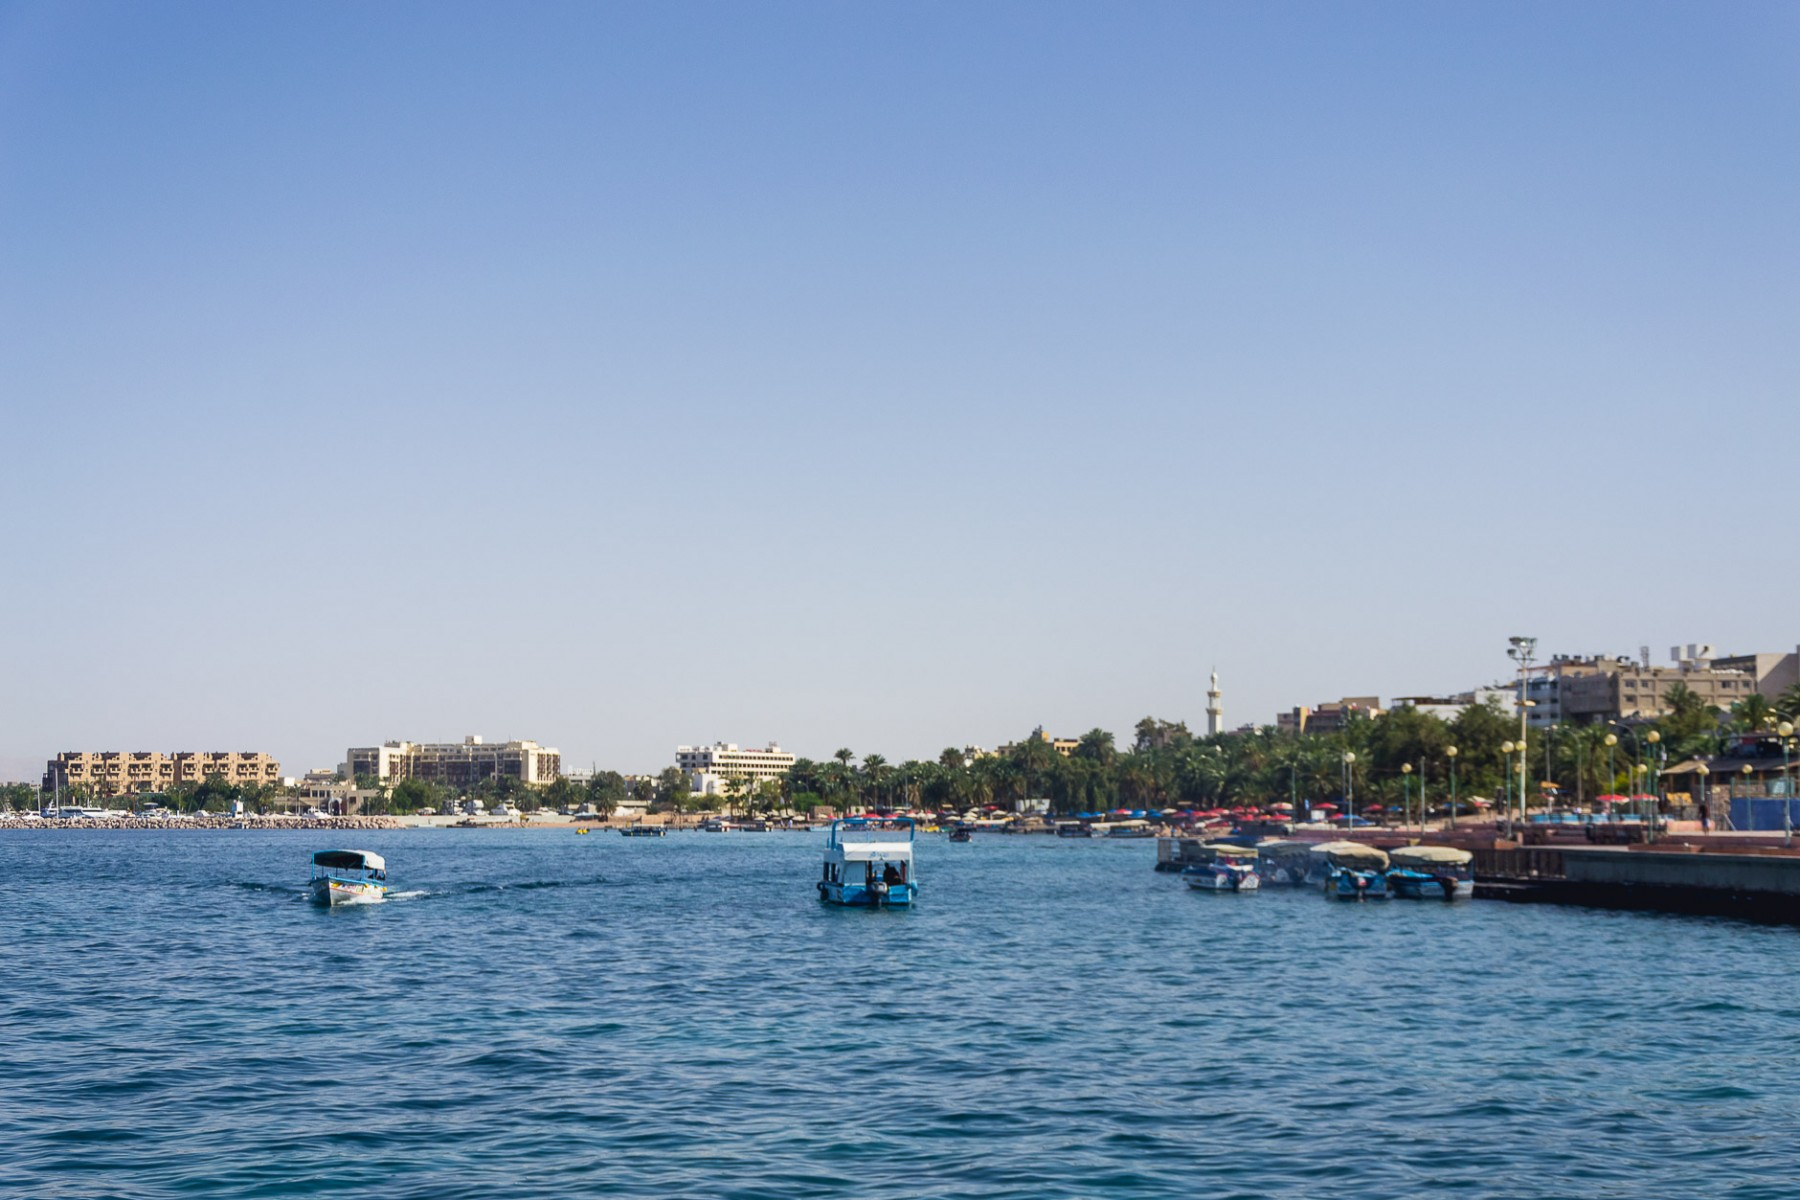 Tala Bay, Jordan